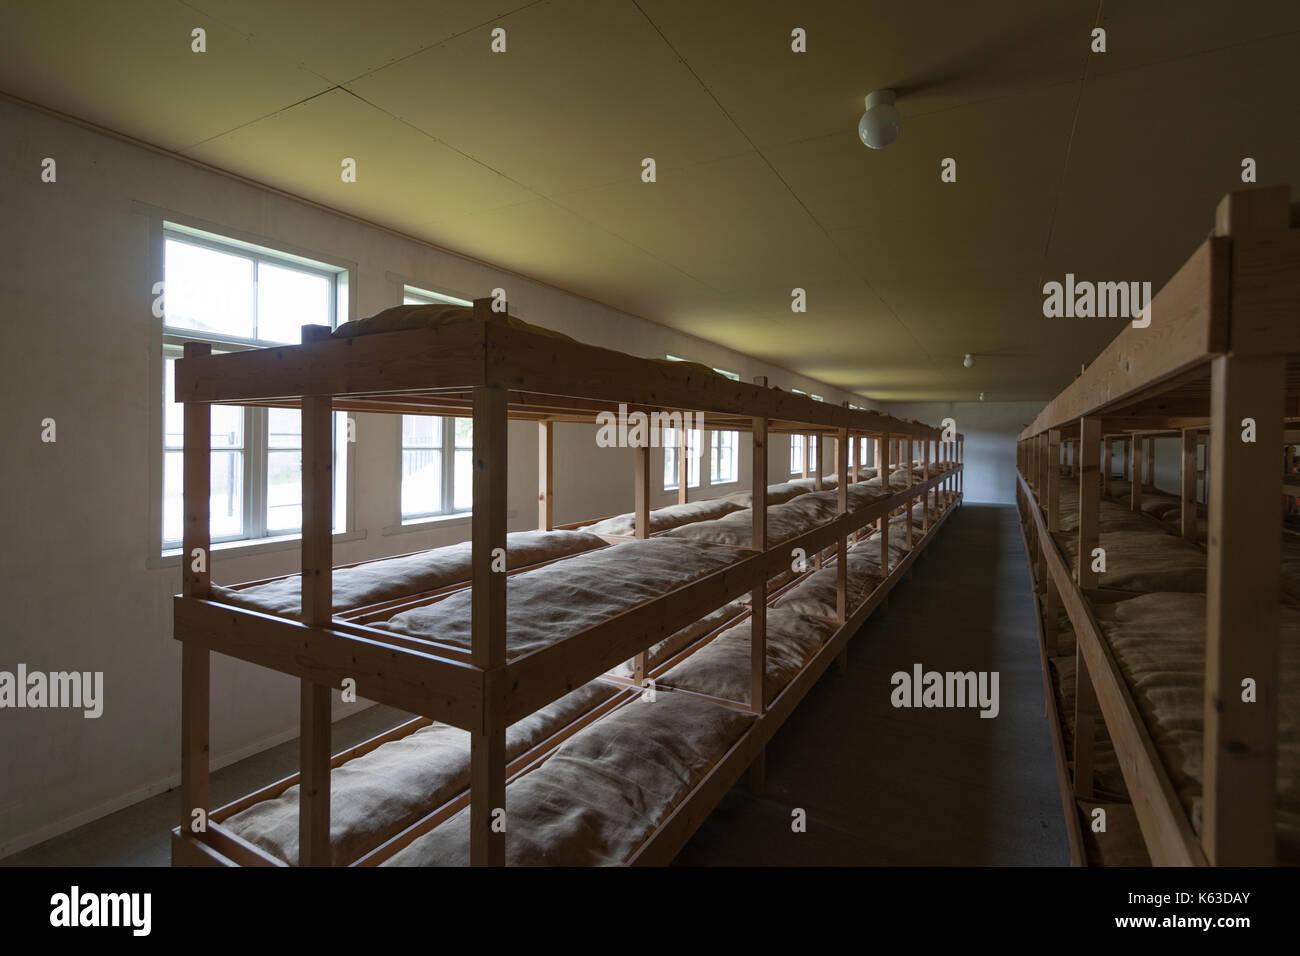 Dormitory Bunk Beds Stock Photos Amp Dormitory Bunk Beds